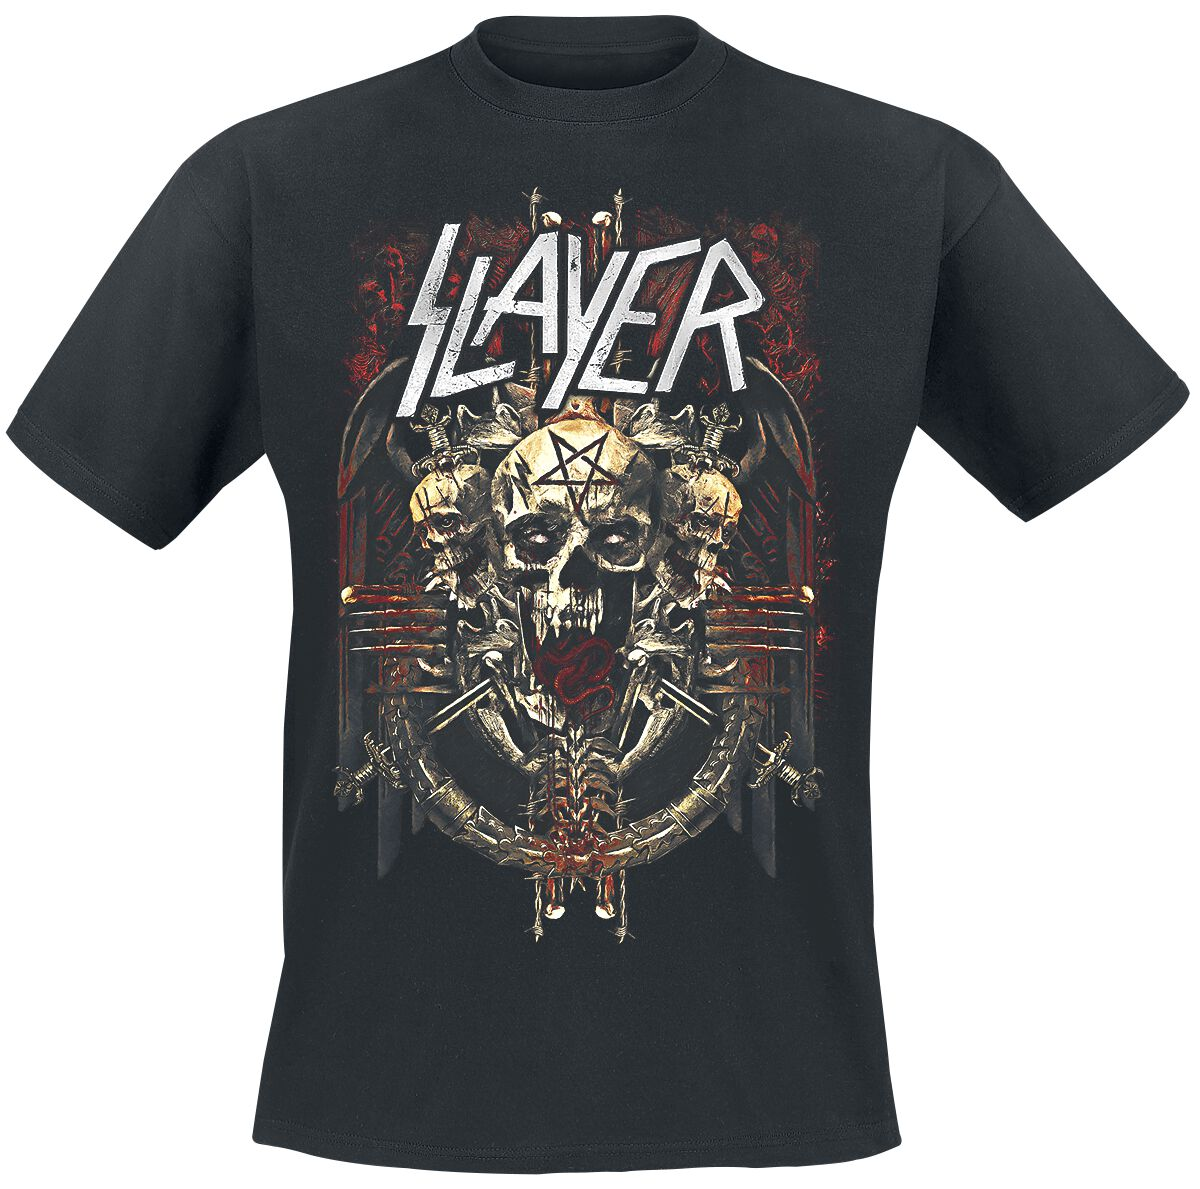 Image of   Slayer Demonic Admat T-Shirt sort